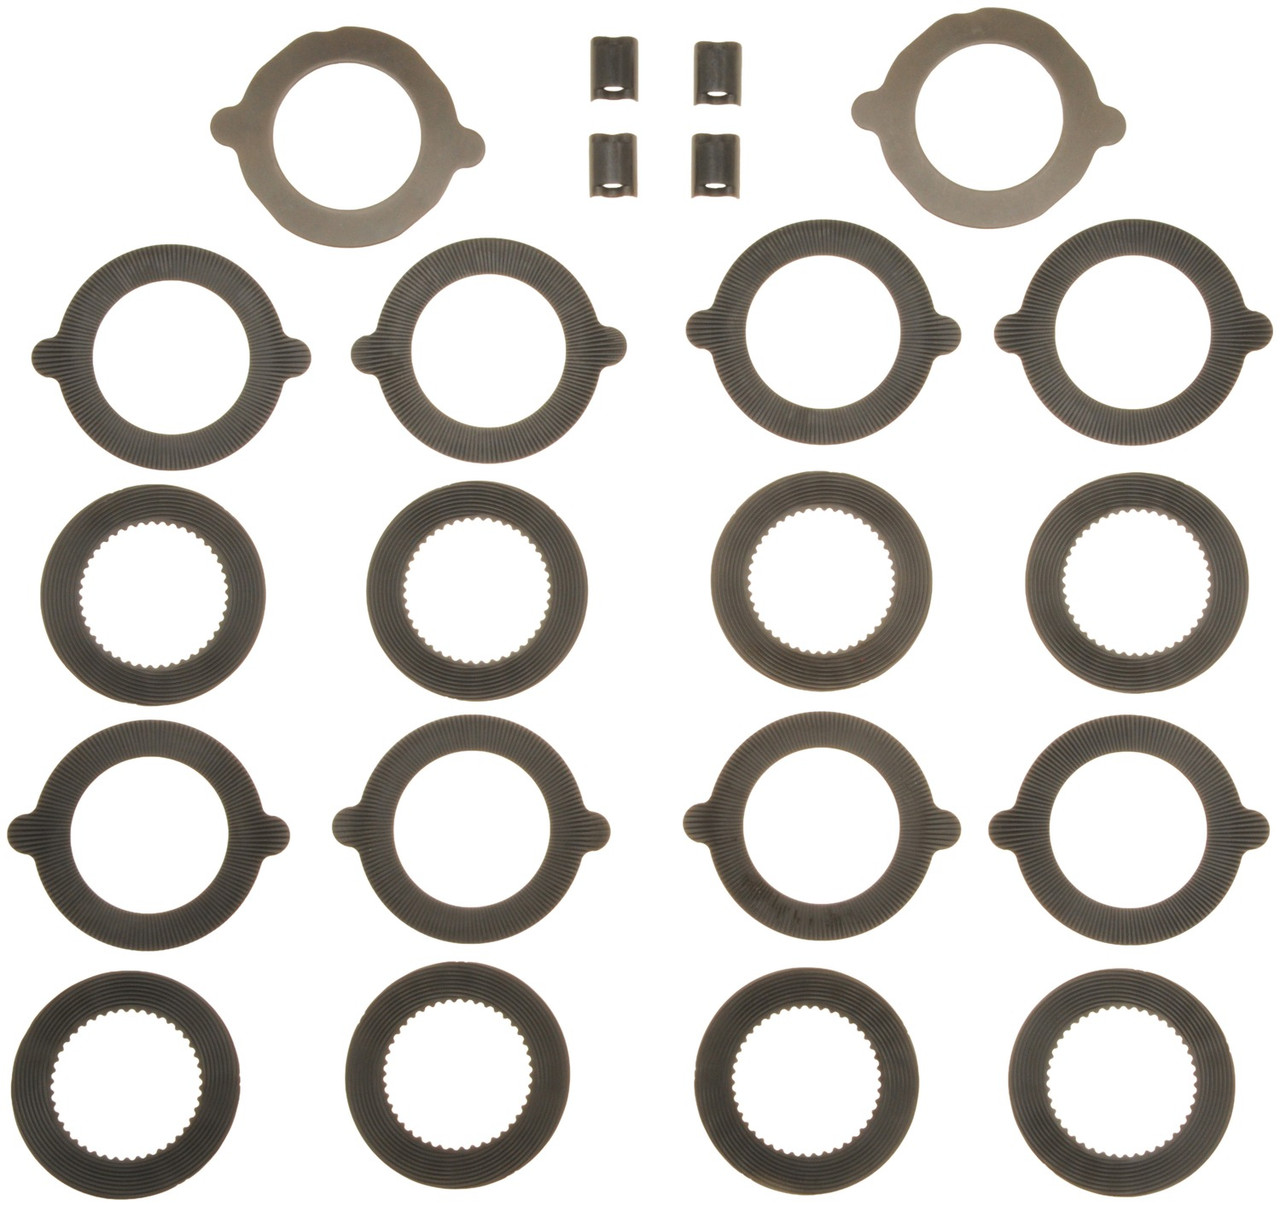 Spicer 701046X Clutch Plate Kit